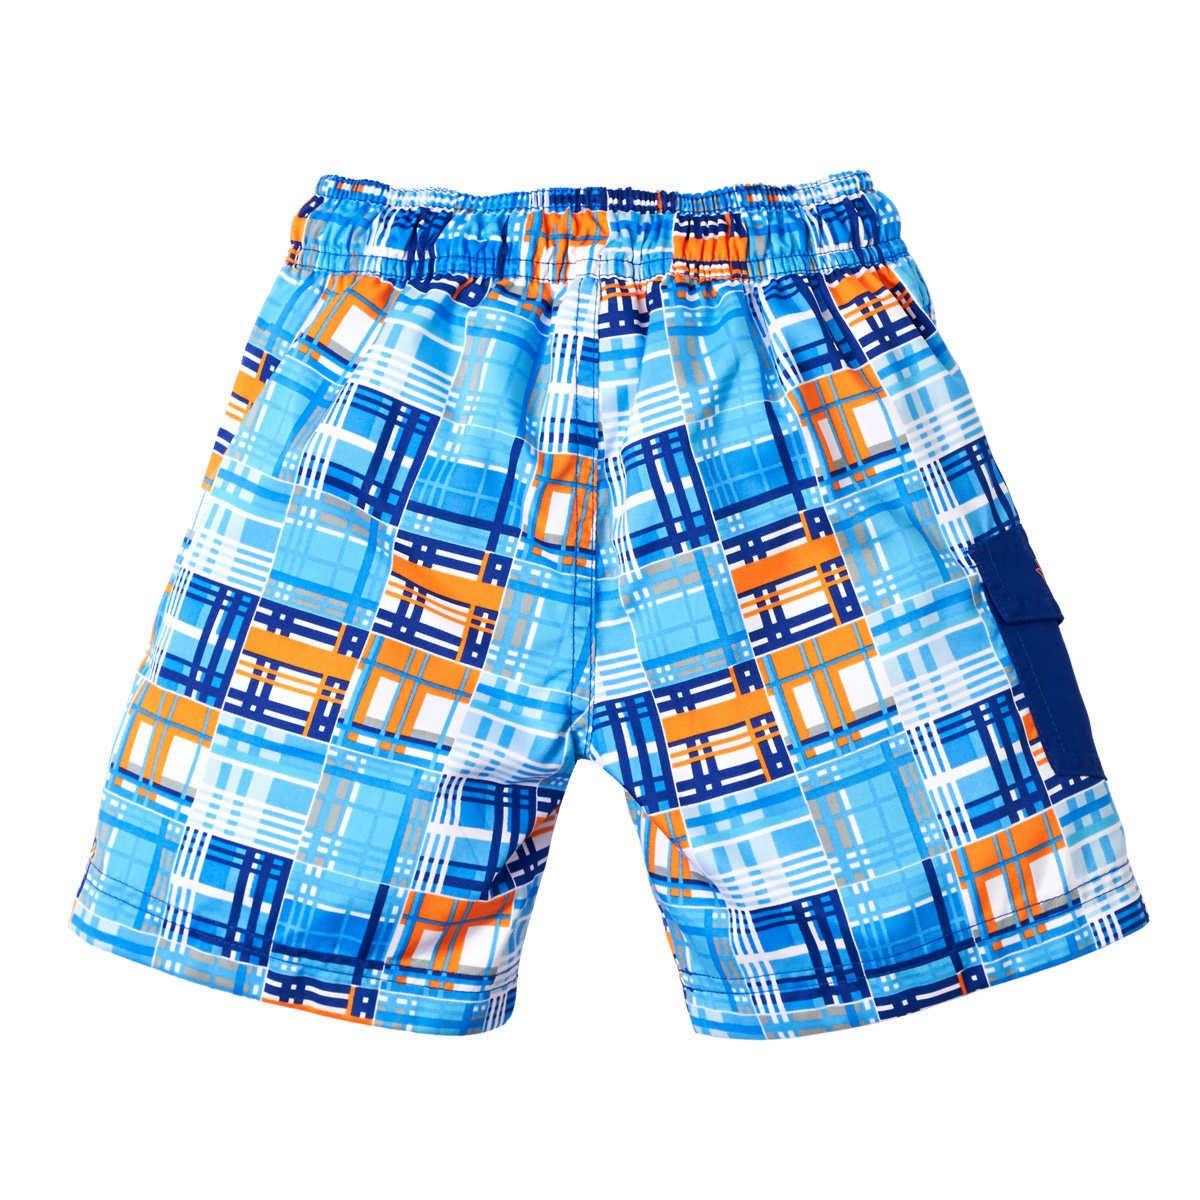 Sun Protection Uv Skinz Boys 3-piece Swim Set UPF 50